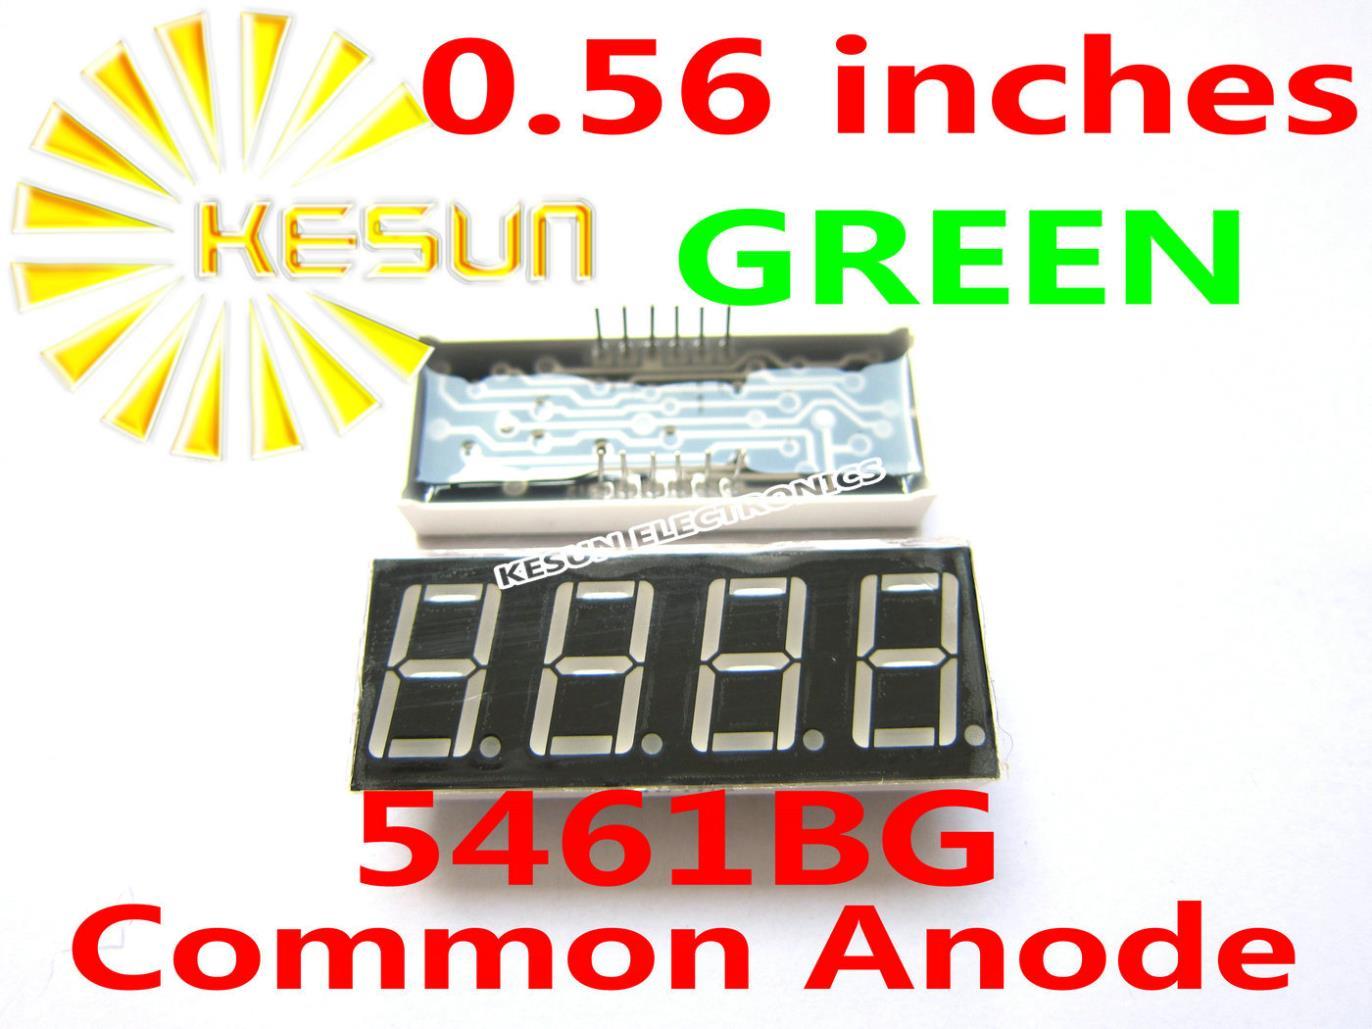 Optoelectronic Displays Diplomatic 50pcs X 0.56 Inches Green Red Blue Jade Green 4 Digital Tube 5461bg 5461ag 5461bs 5461as 5461agg 5461bgg Led Display Module 100% Original